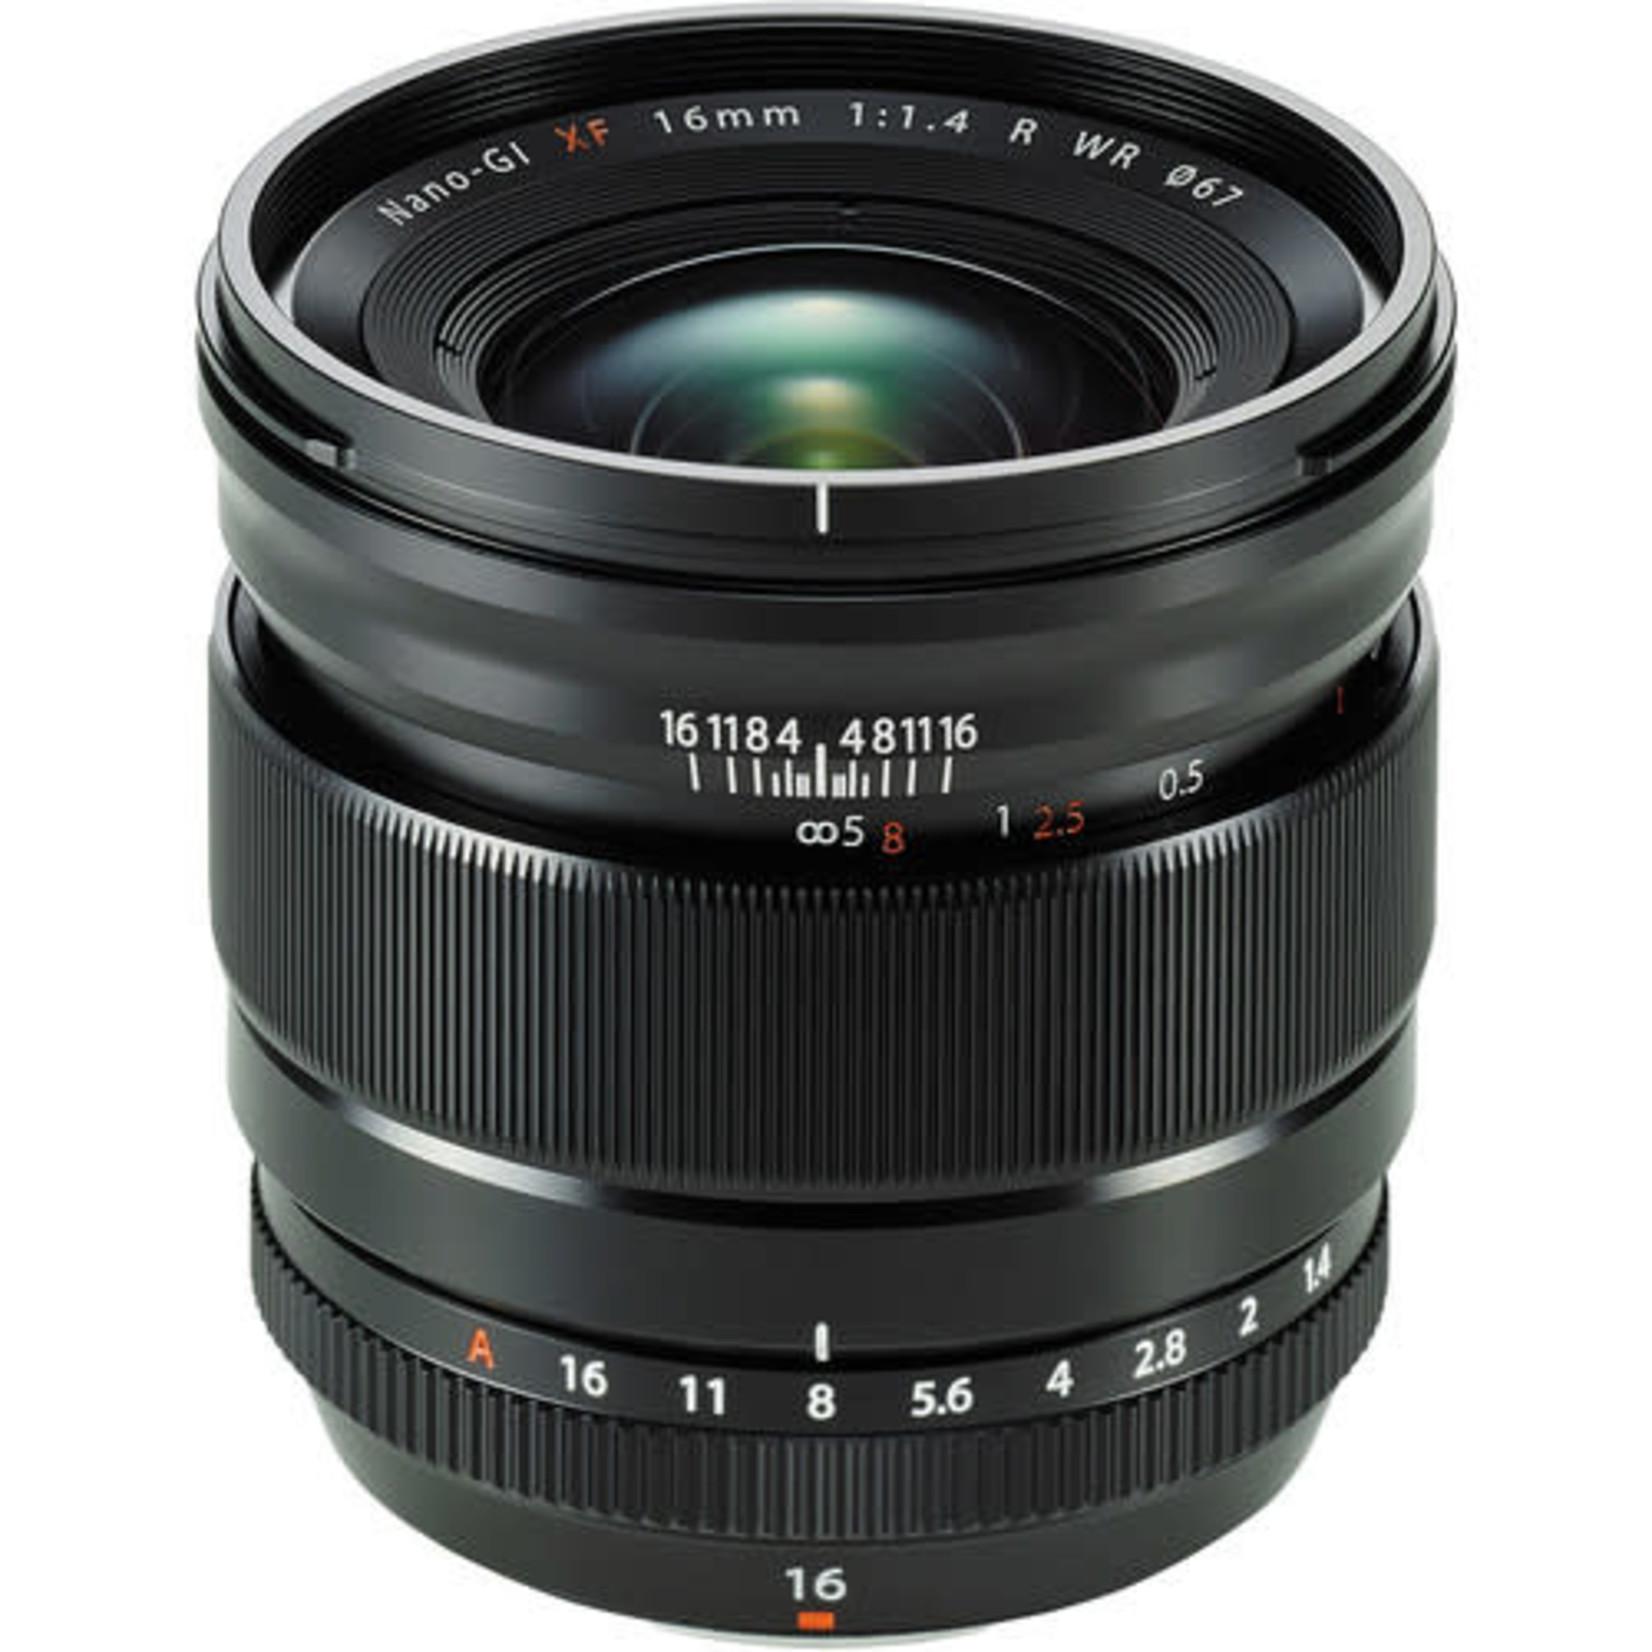 FujiFilm FujiFilm XF 16mm f/1.4 R WR Lens